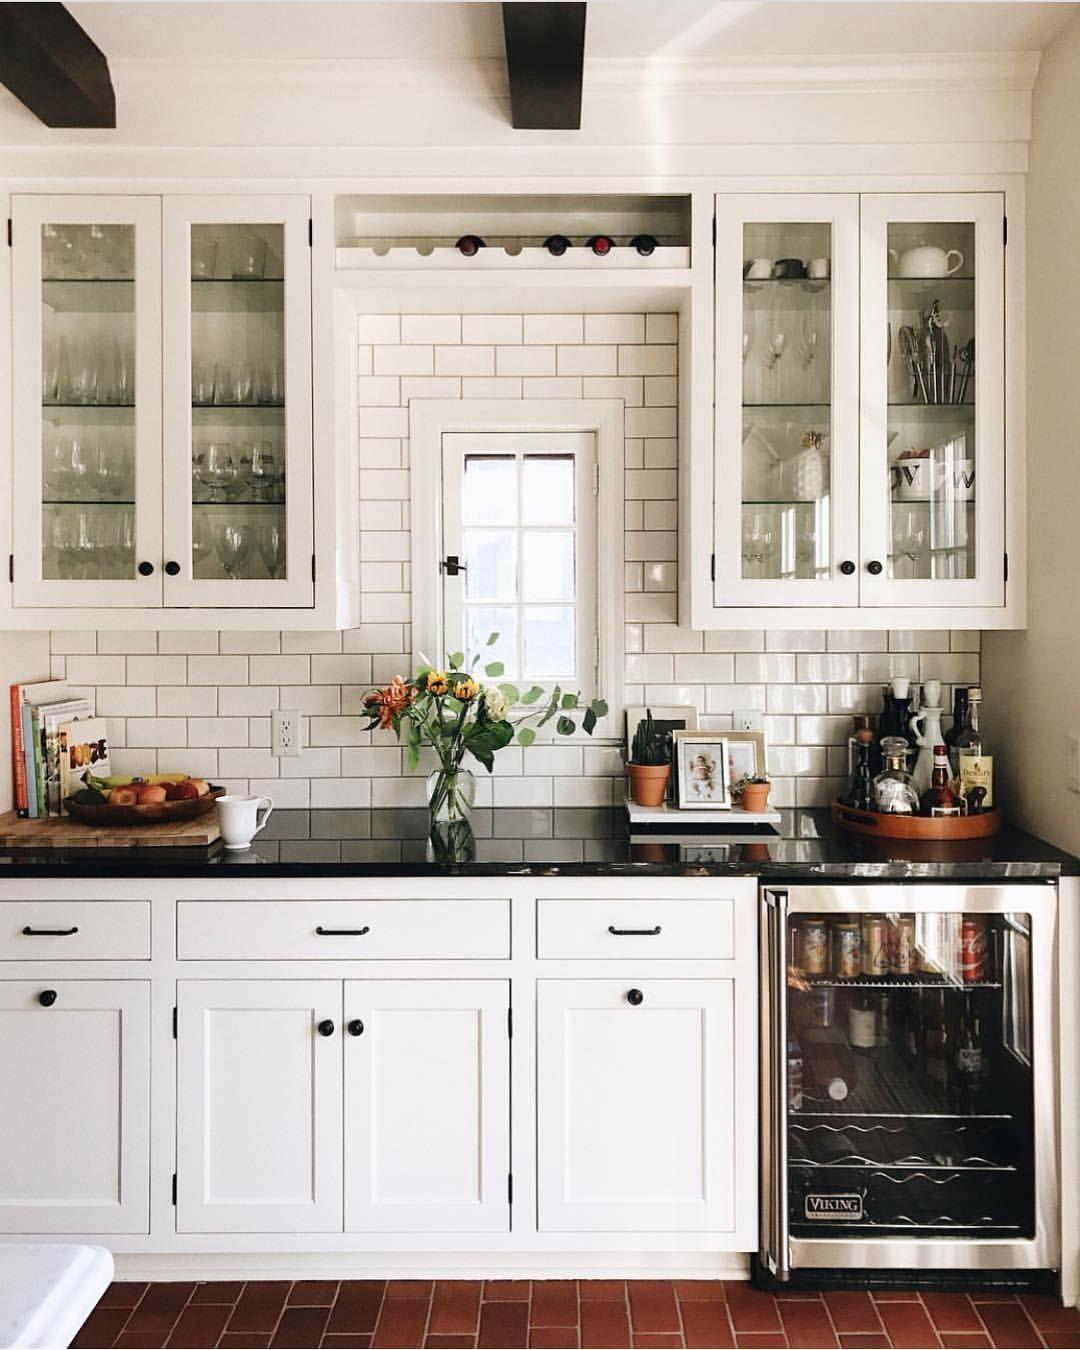 Famous Pretty Kitchens Pictures Best Kitchen Ideas icontaincom